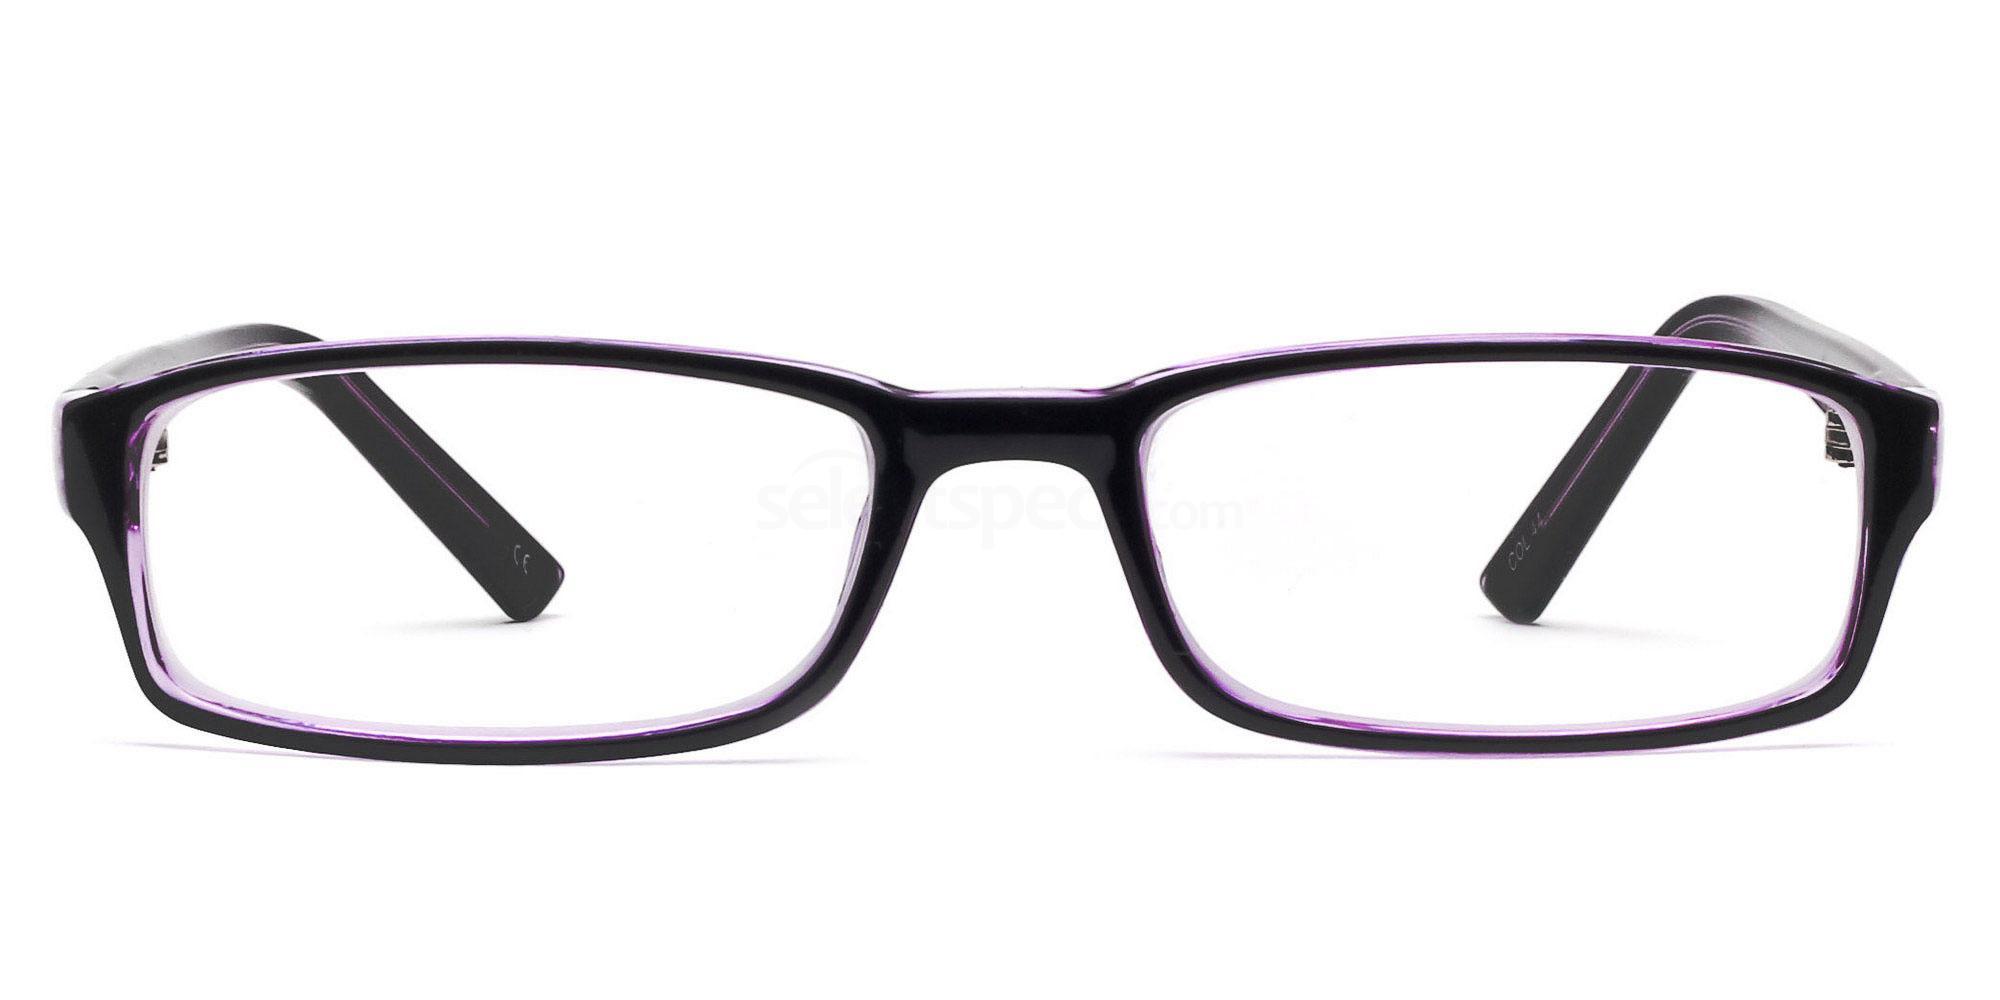 COL.44 2264 - Purple and Black Glasses, Savannah